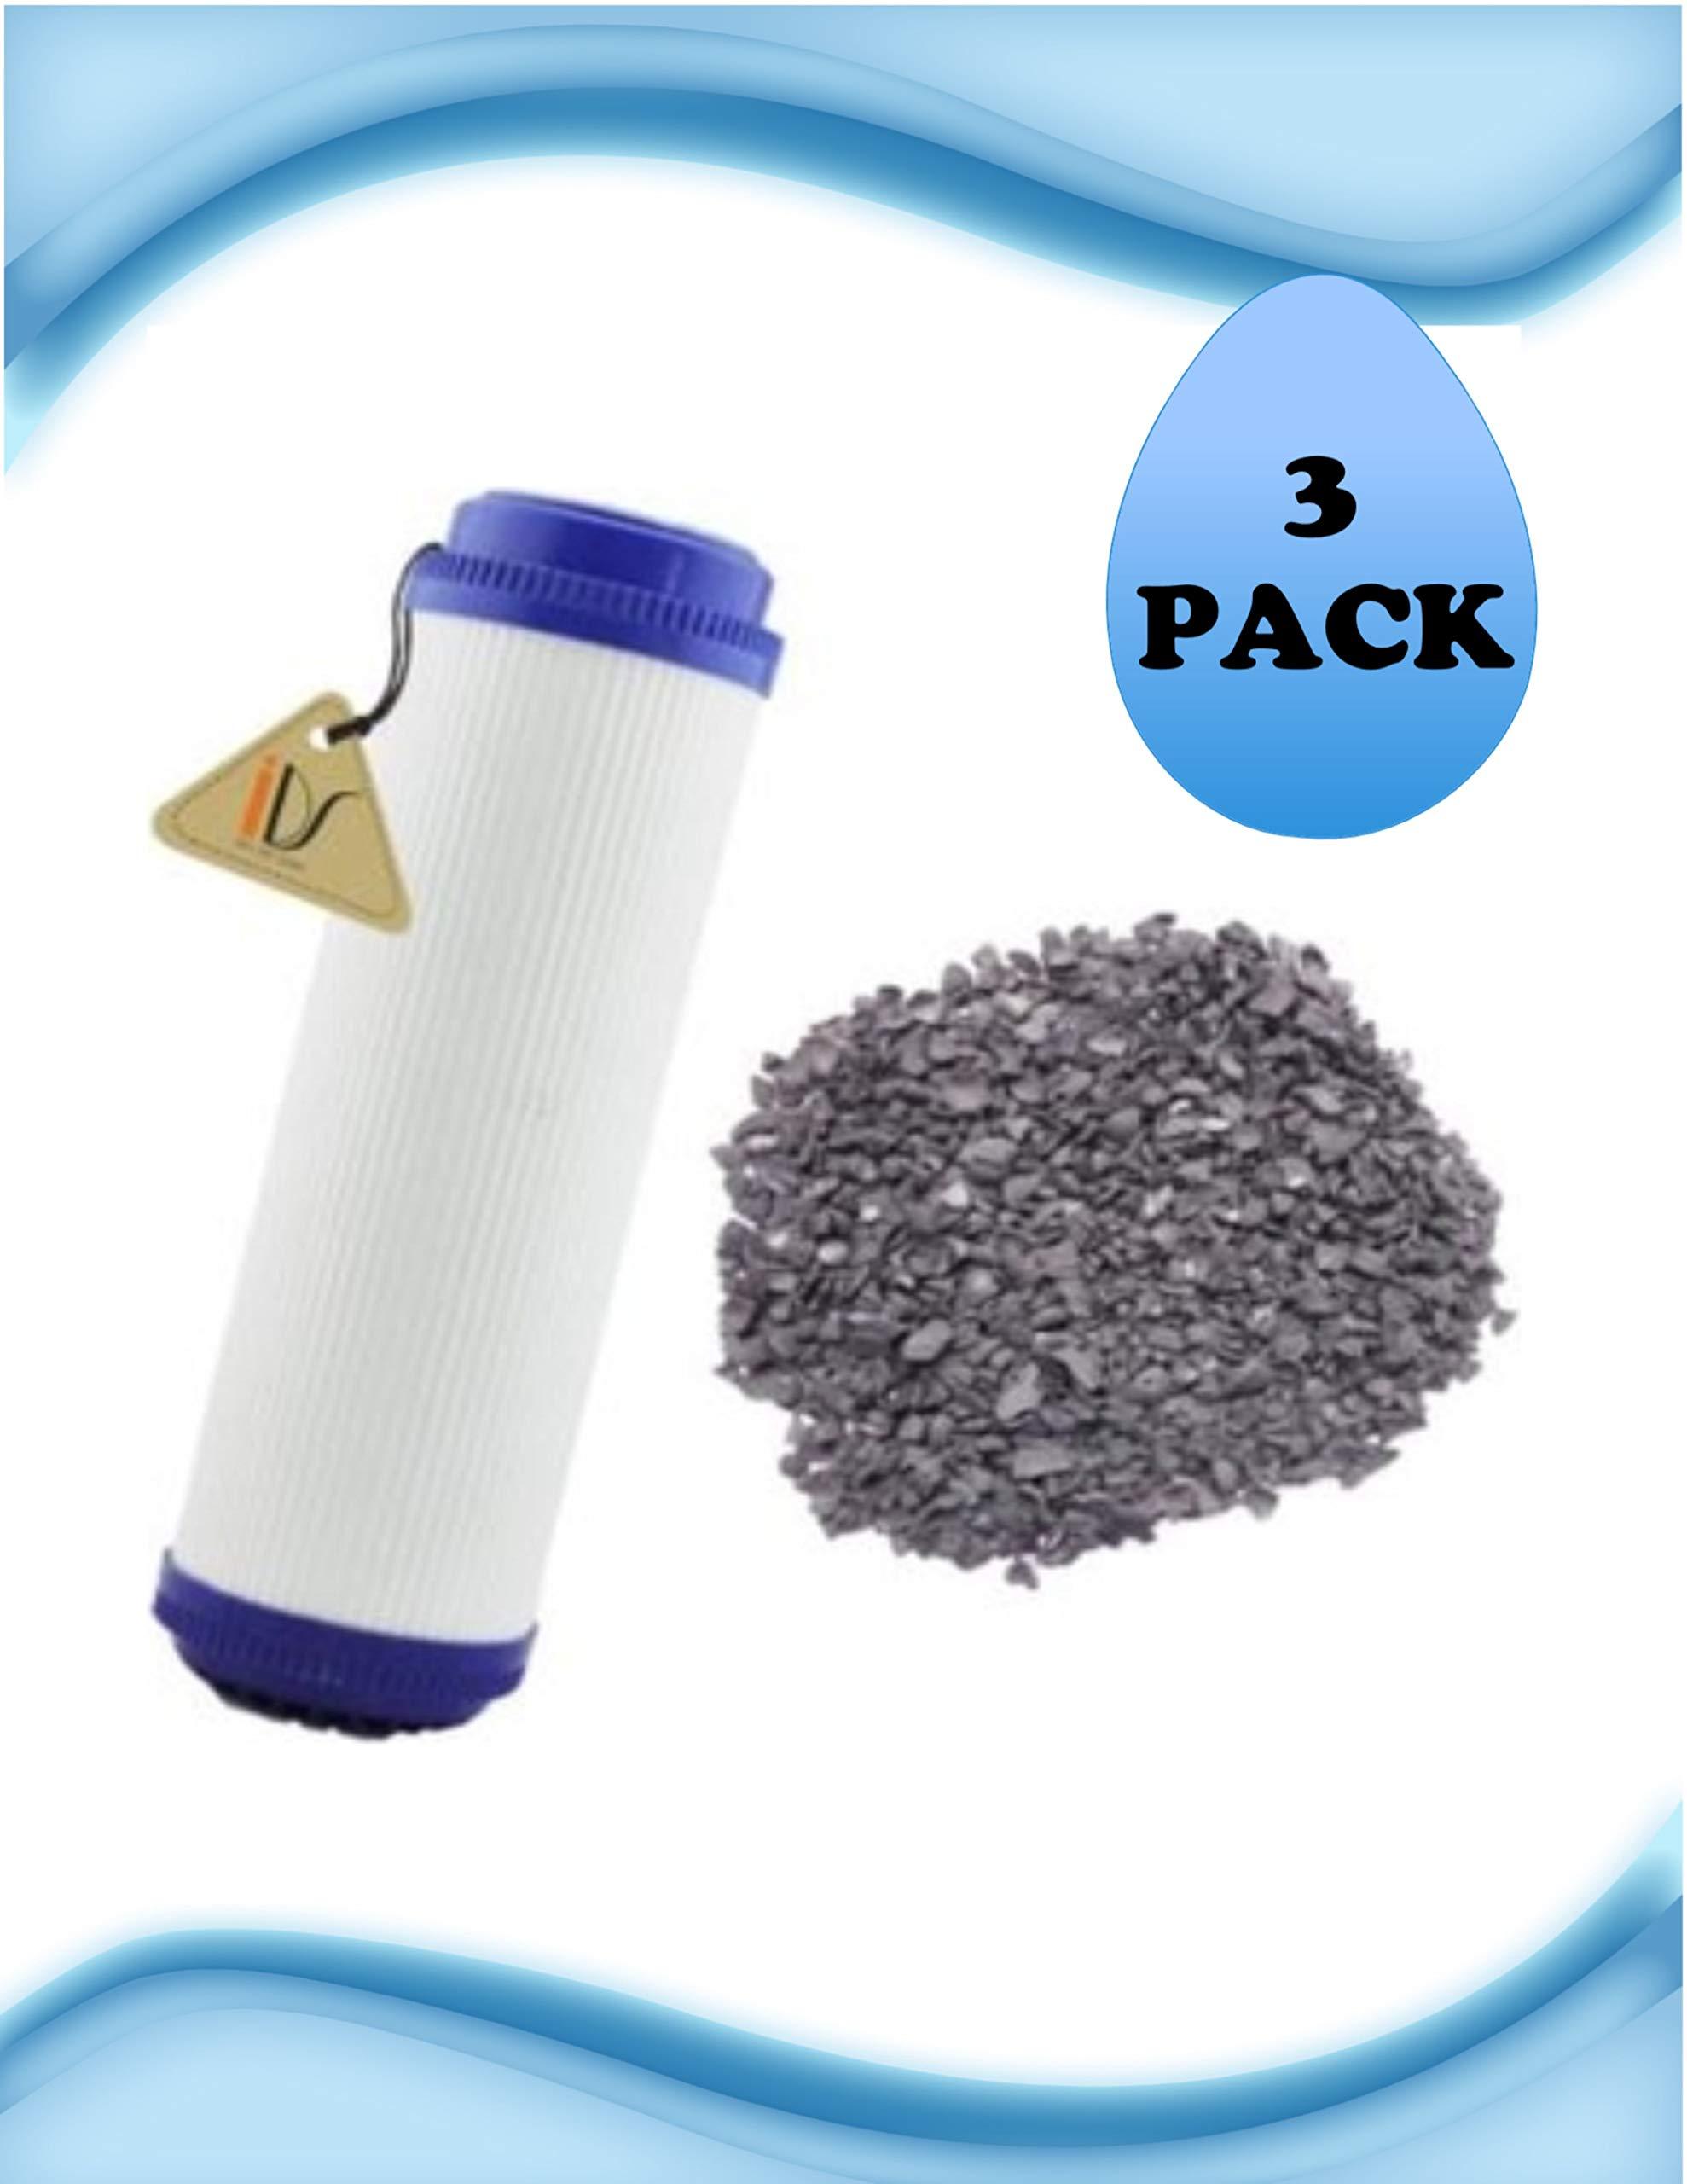 3 Pack of OMNIFilter GAC1-SS Compatible TASTE/ODOR FILTERS